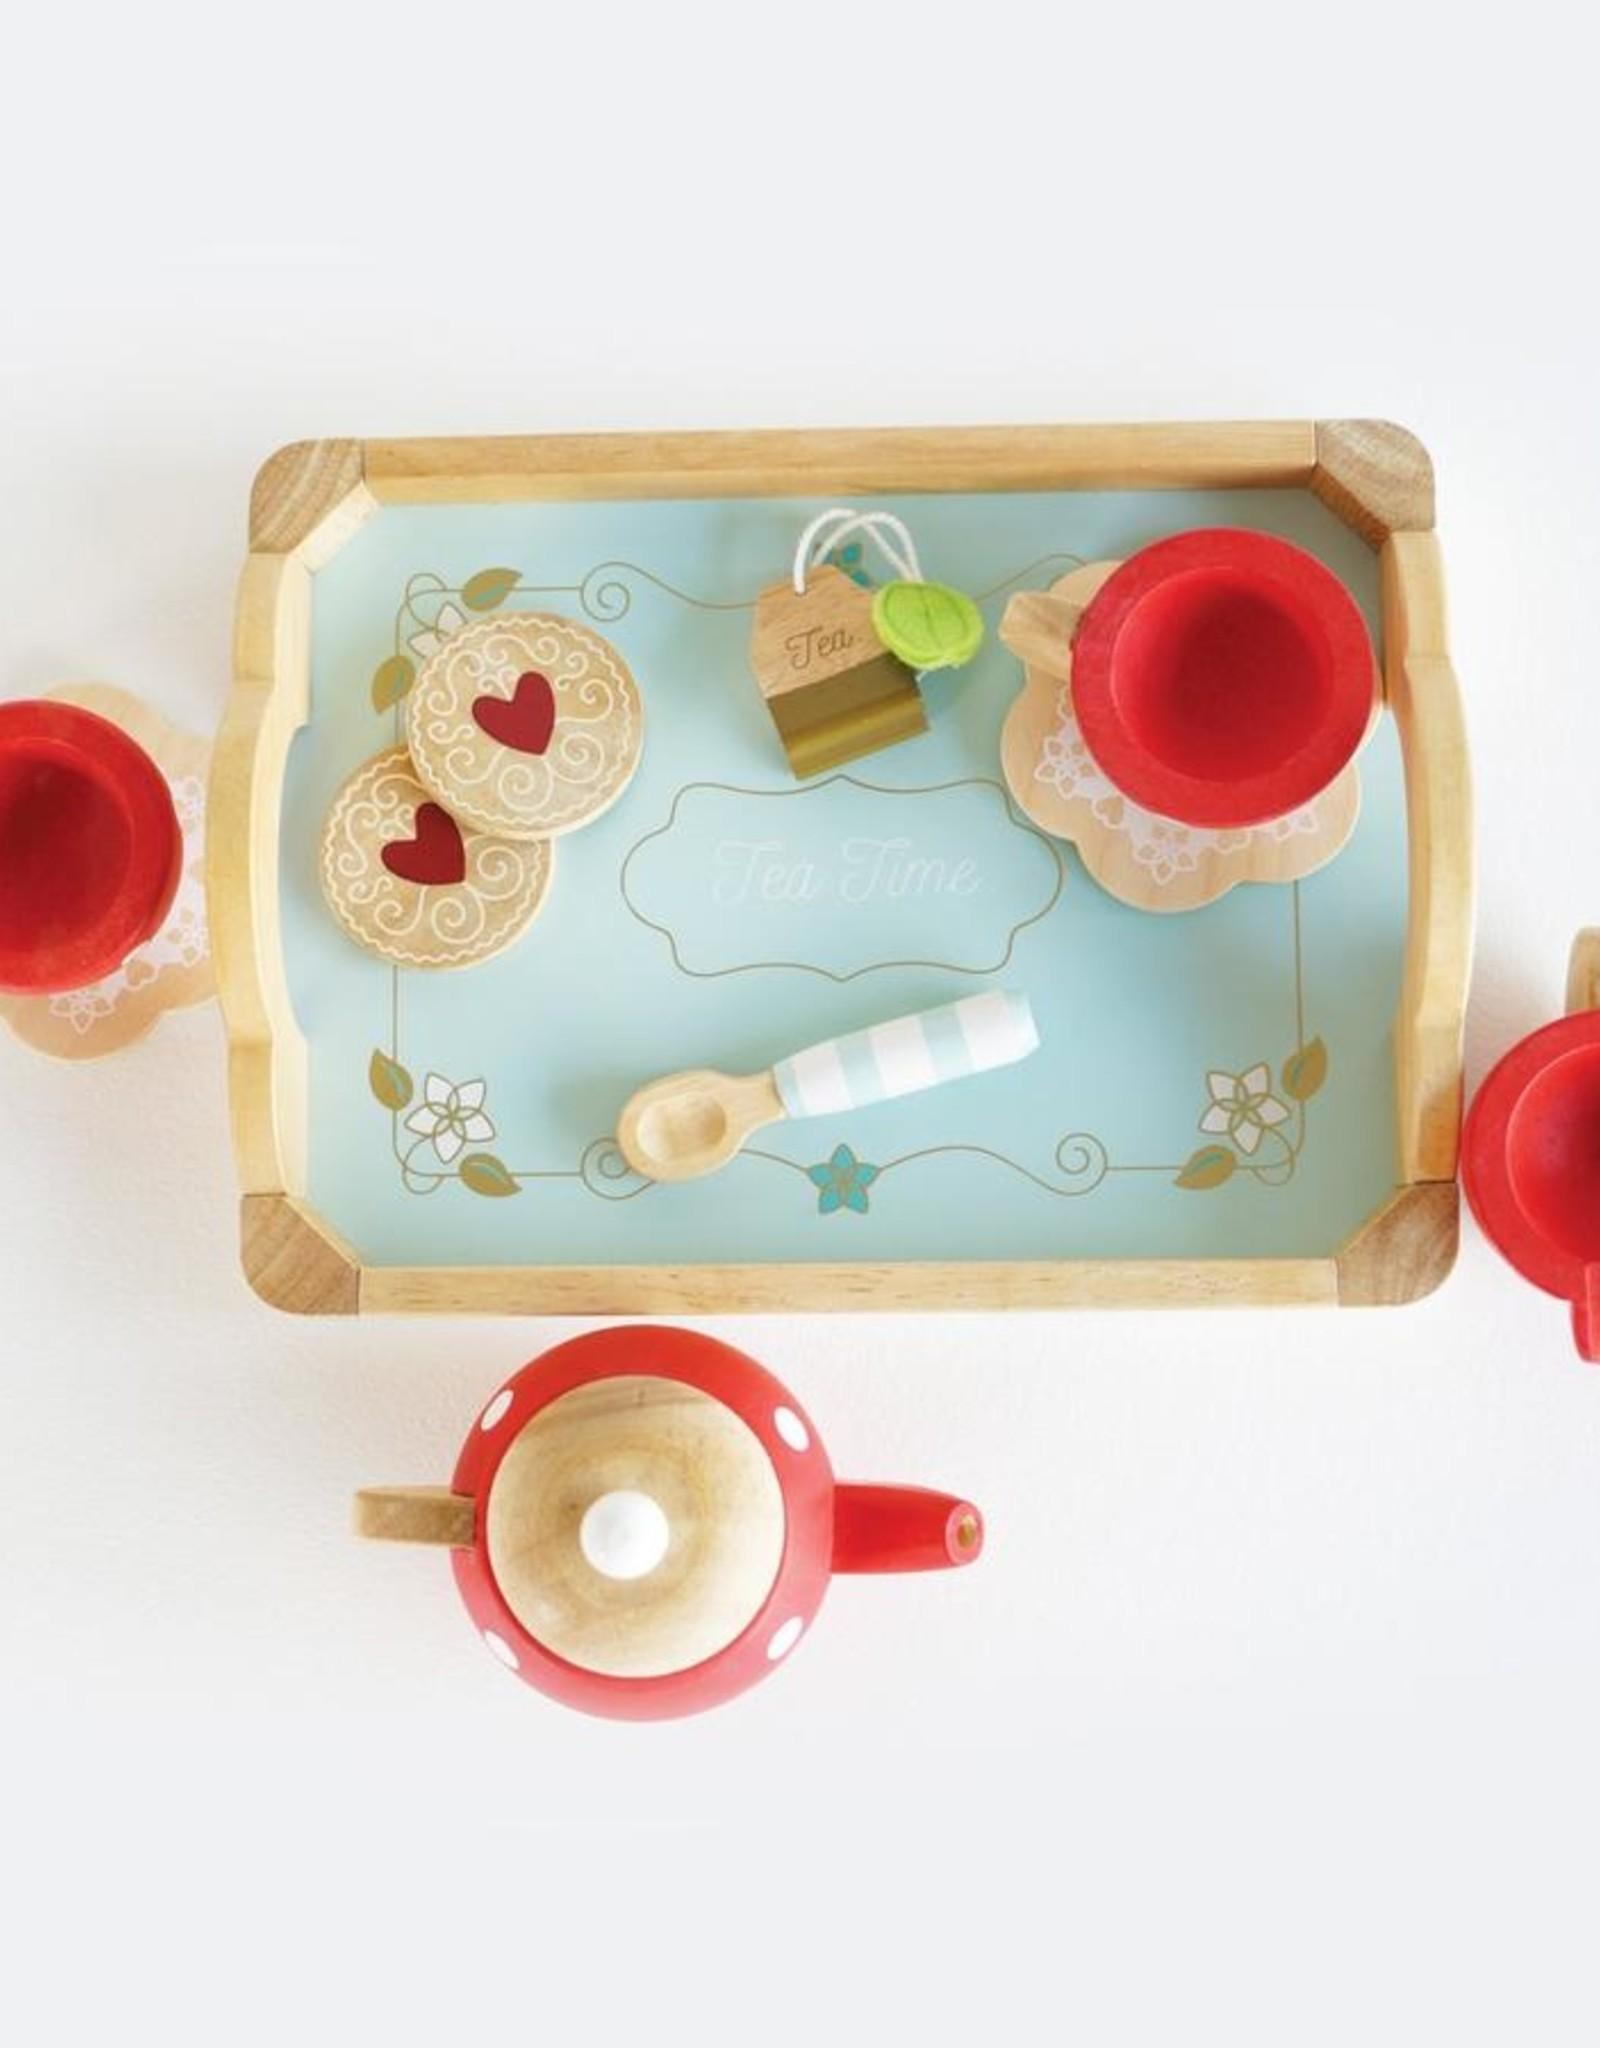 Letoy van Tea and tray set